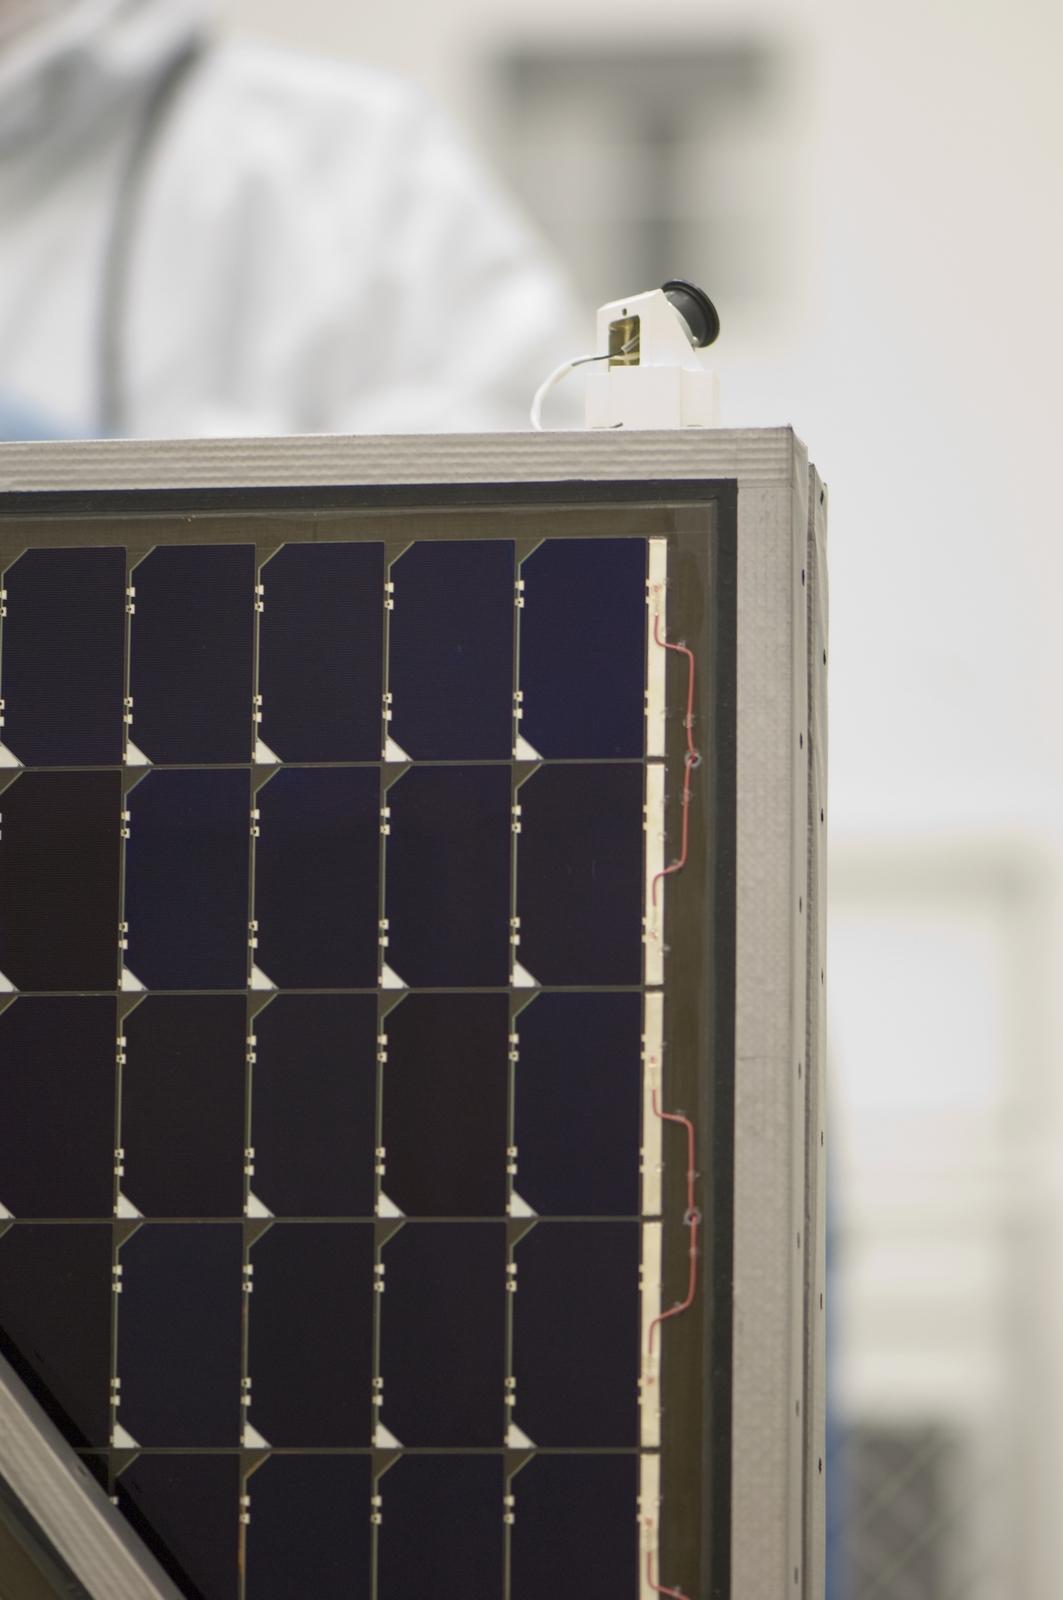 NASA's Lunar Reconnaissance Orbiter (LRO)  POP + CATCH TEST + SOLAR PANEL